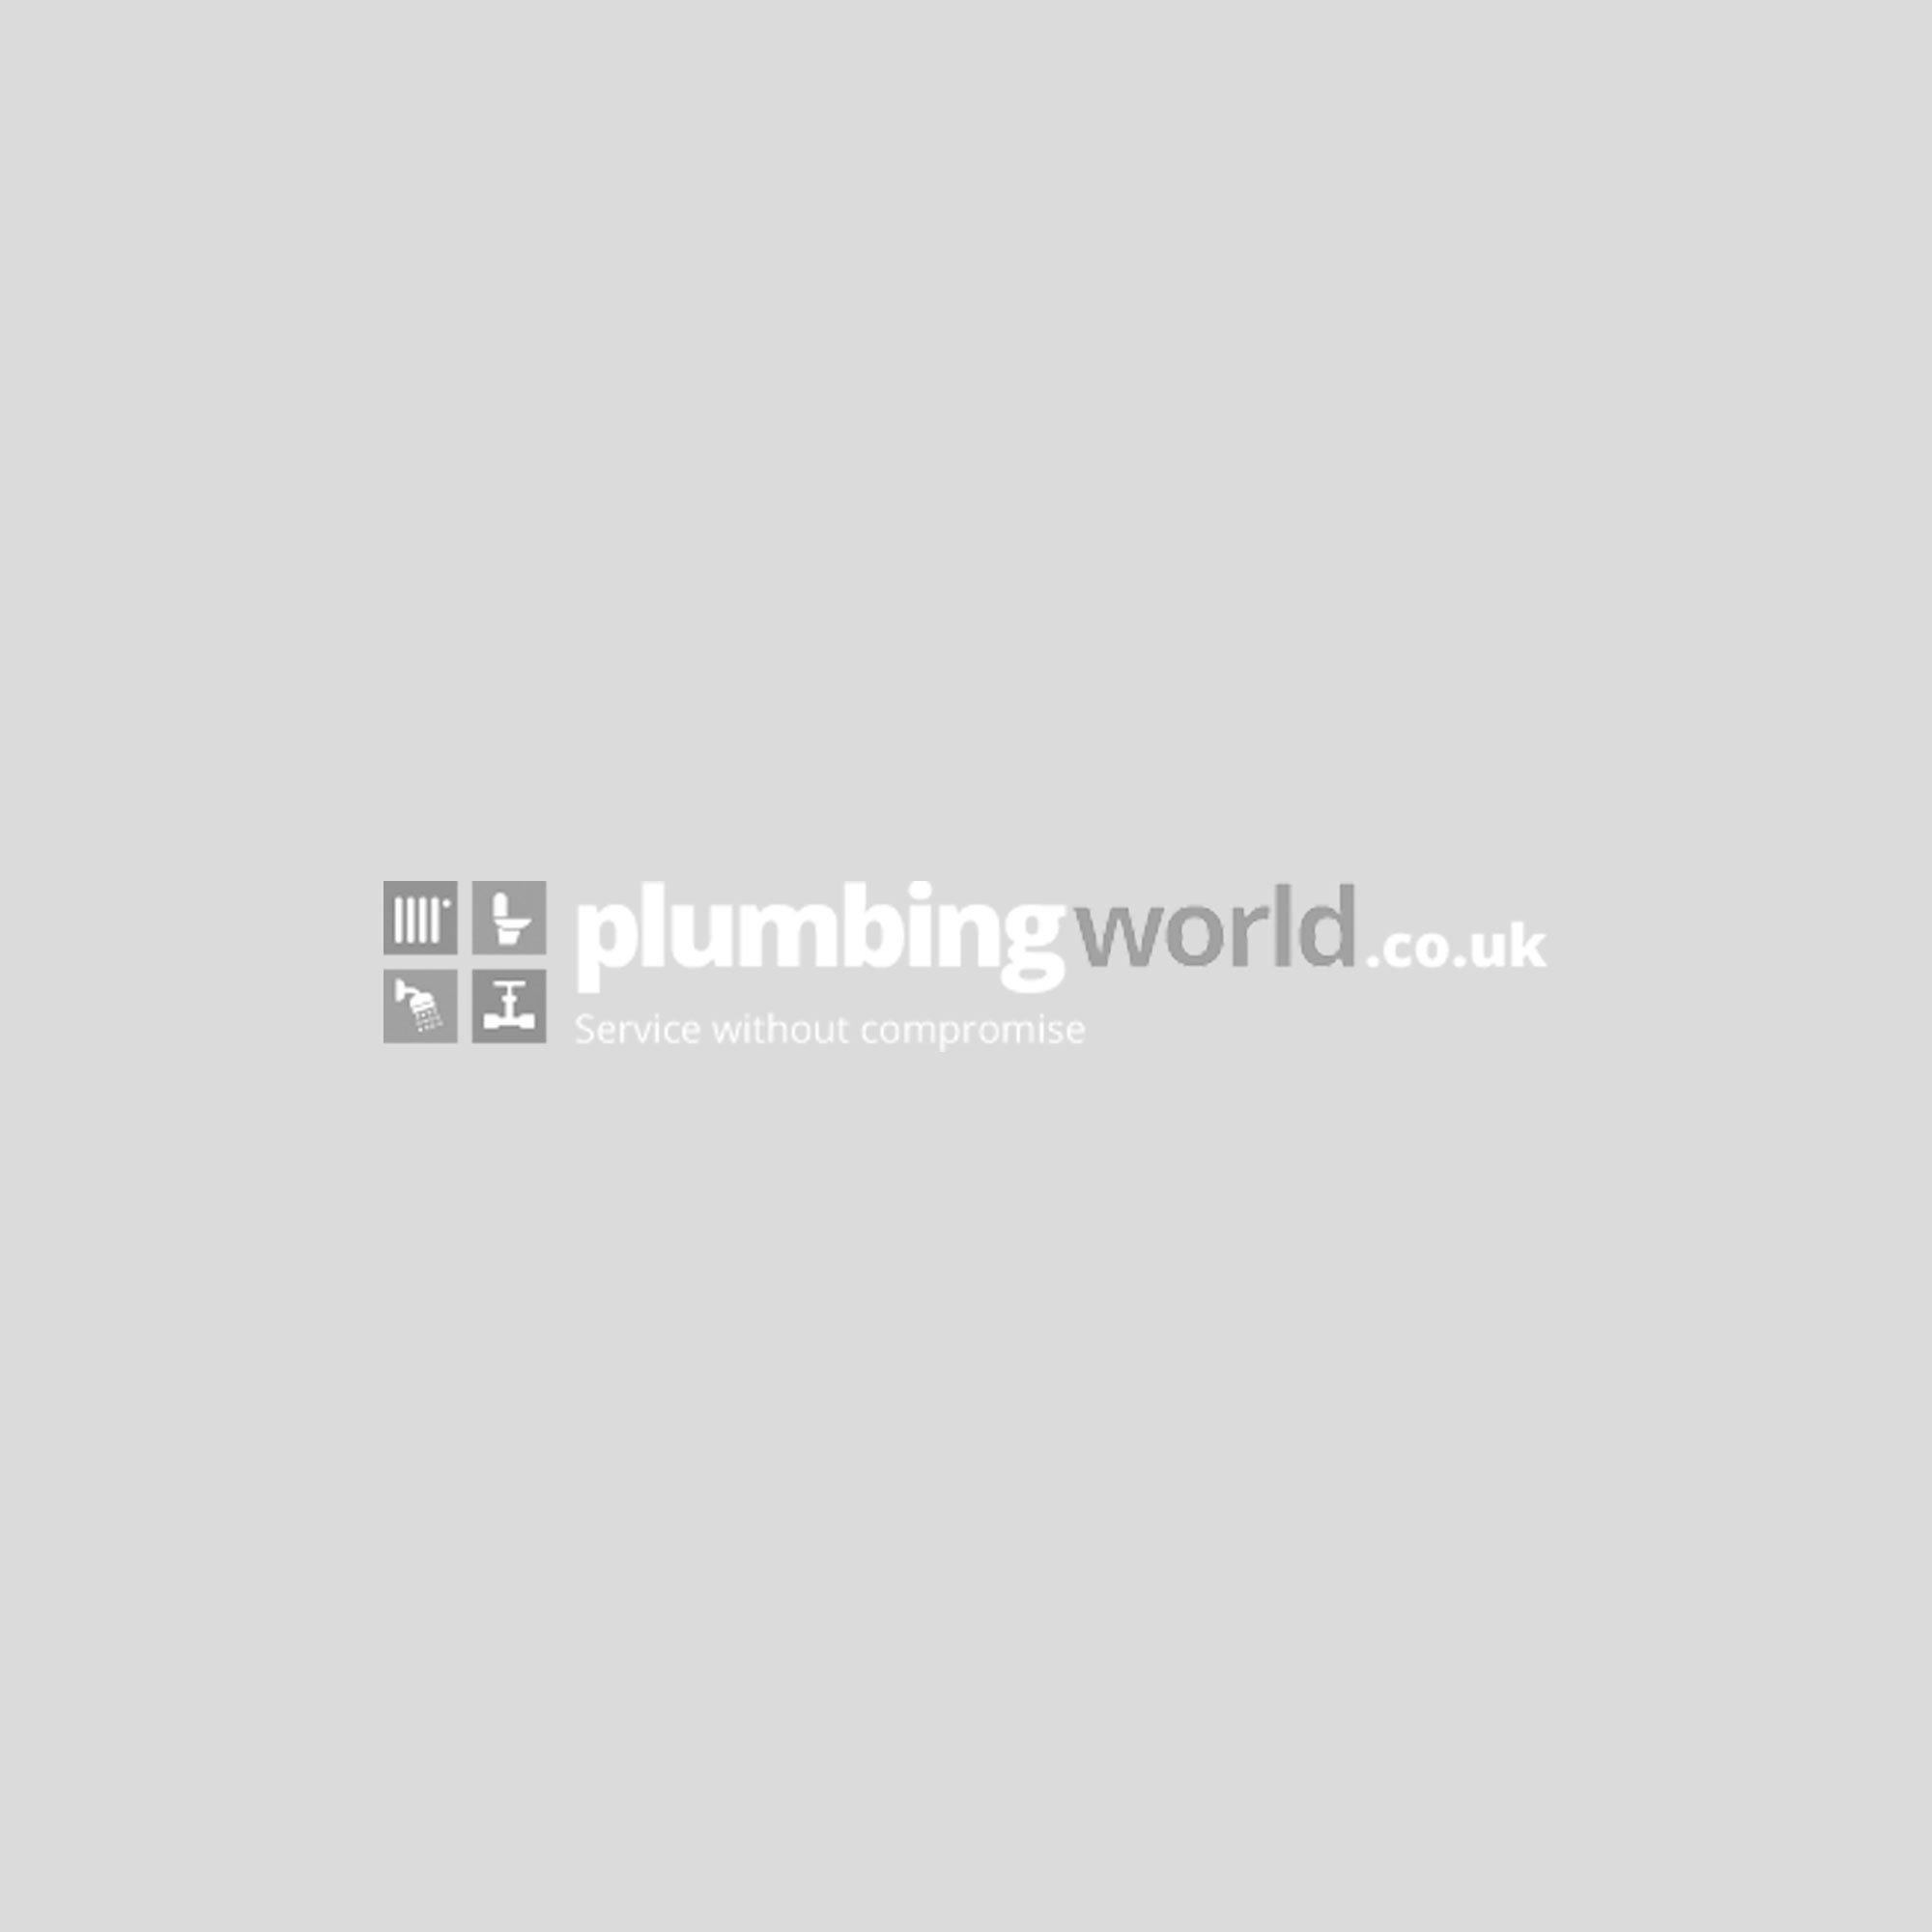 1200mm wide x 2400mm High x 10mm Depth PVC Shower Panel - White Marble Matt